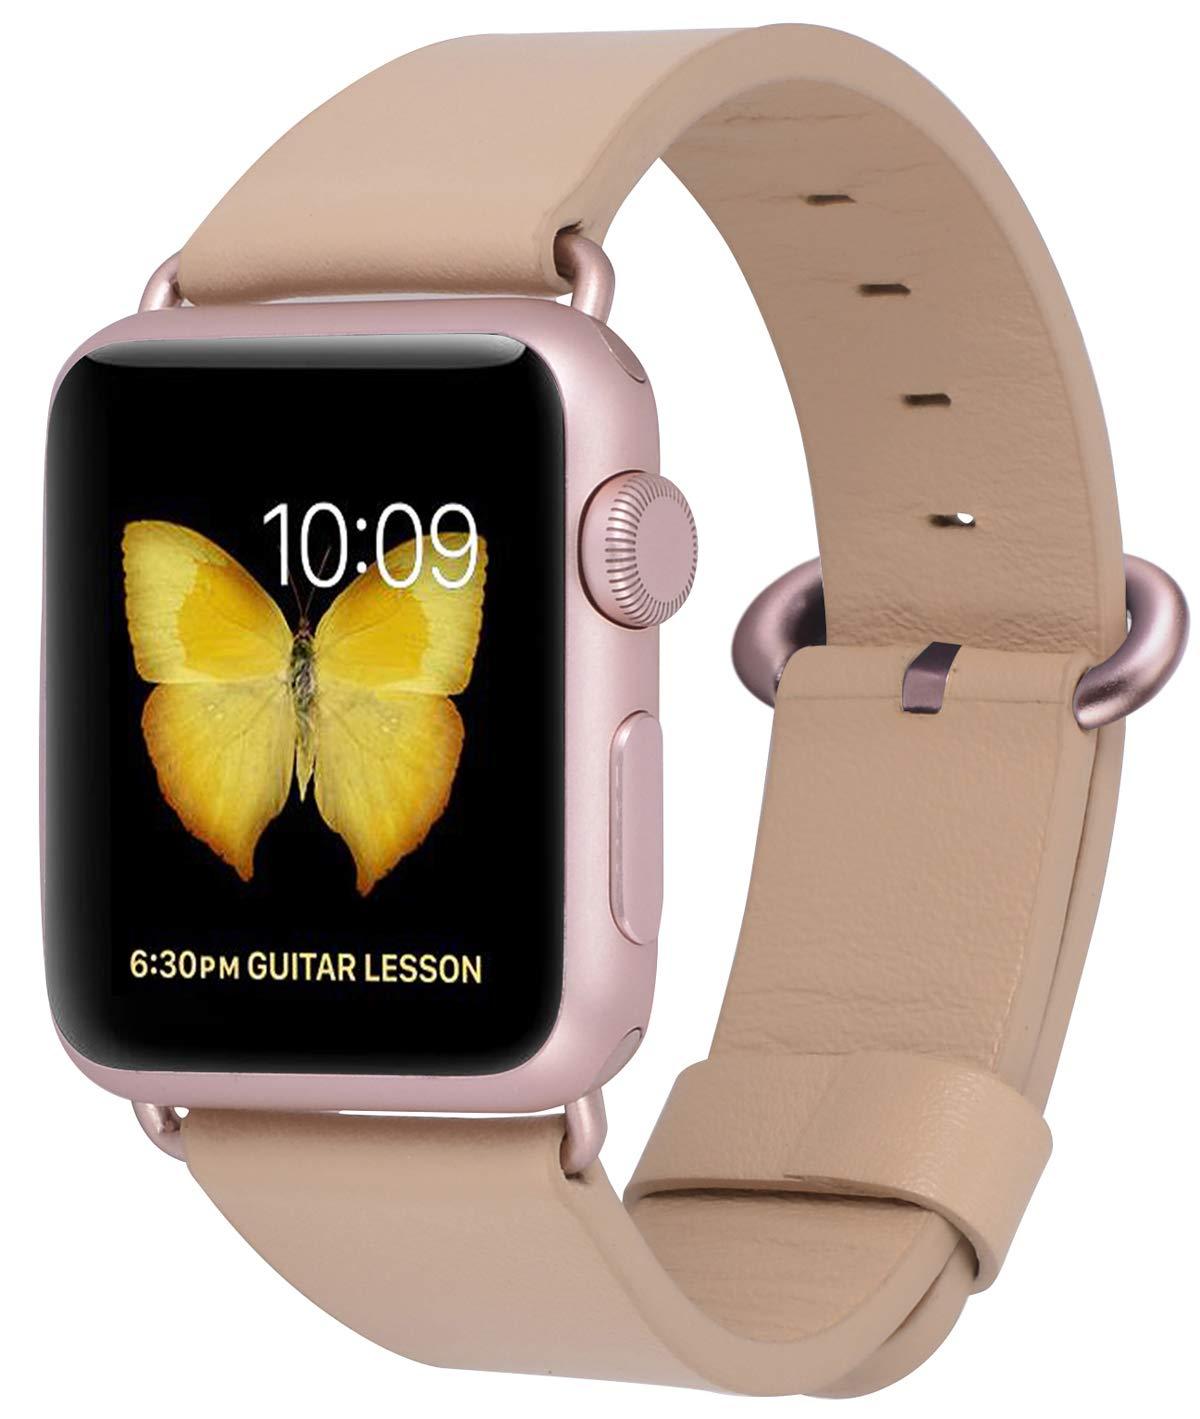 Malla Cuero para Apple Watch (38/40mm) PEAK ZHANG [7JN3WHWL]